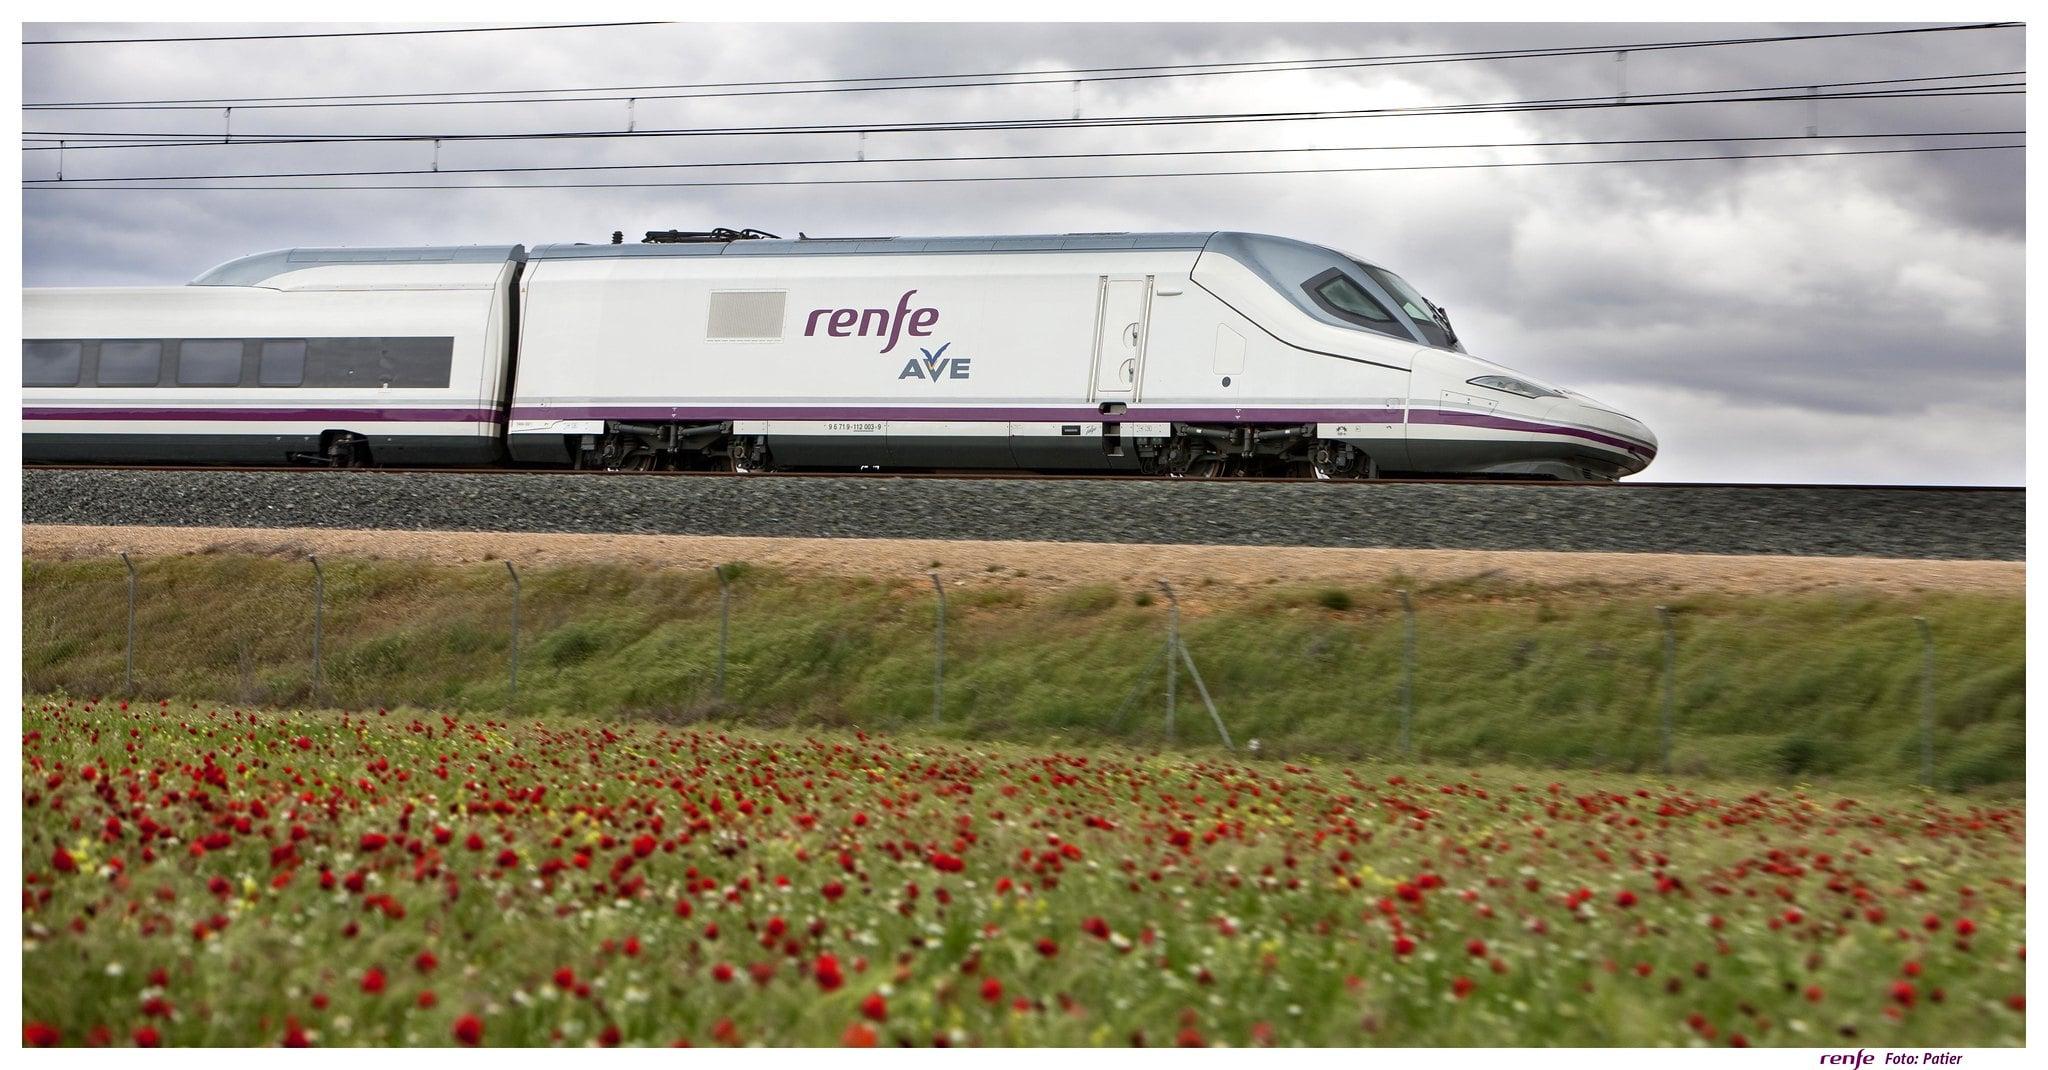 El número de pasajeros de Renfe bajó un 54% en febrero respecto a 2020